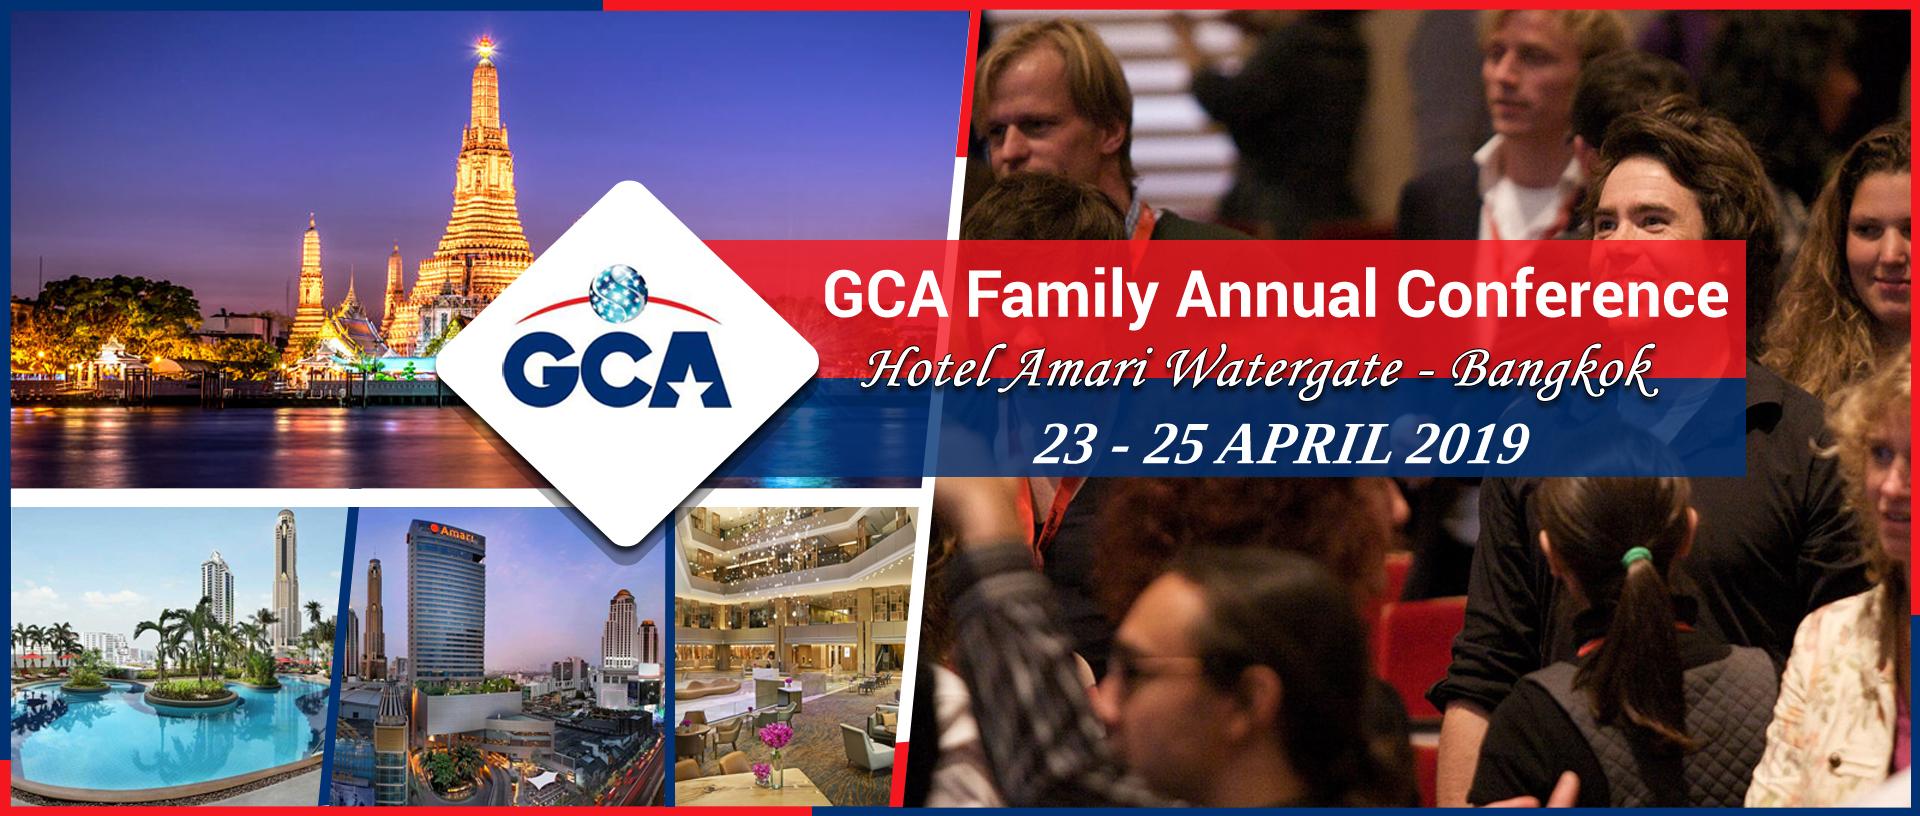 GCA Family Annual Conference 2019, Hotel Amari Watergate, Bangkok, Thailand